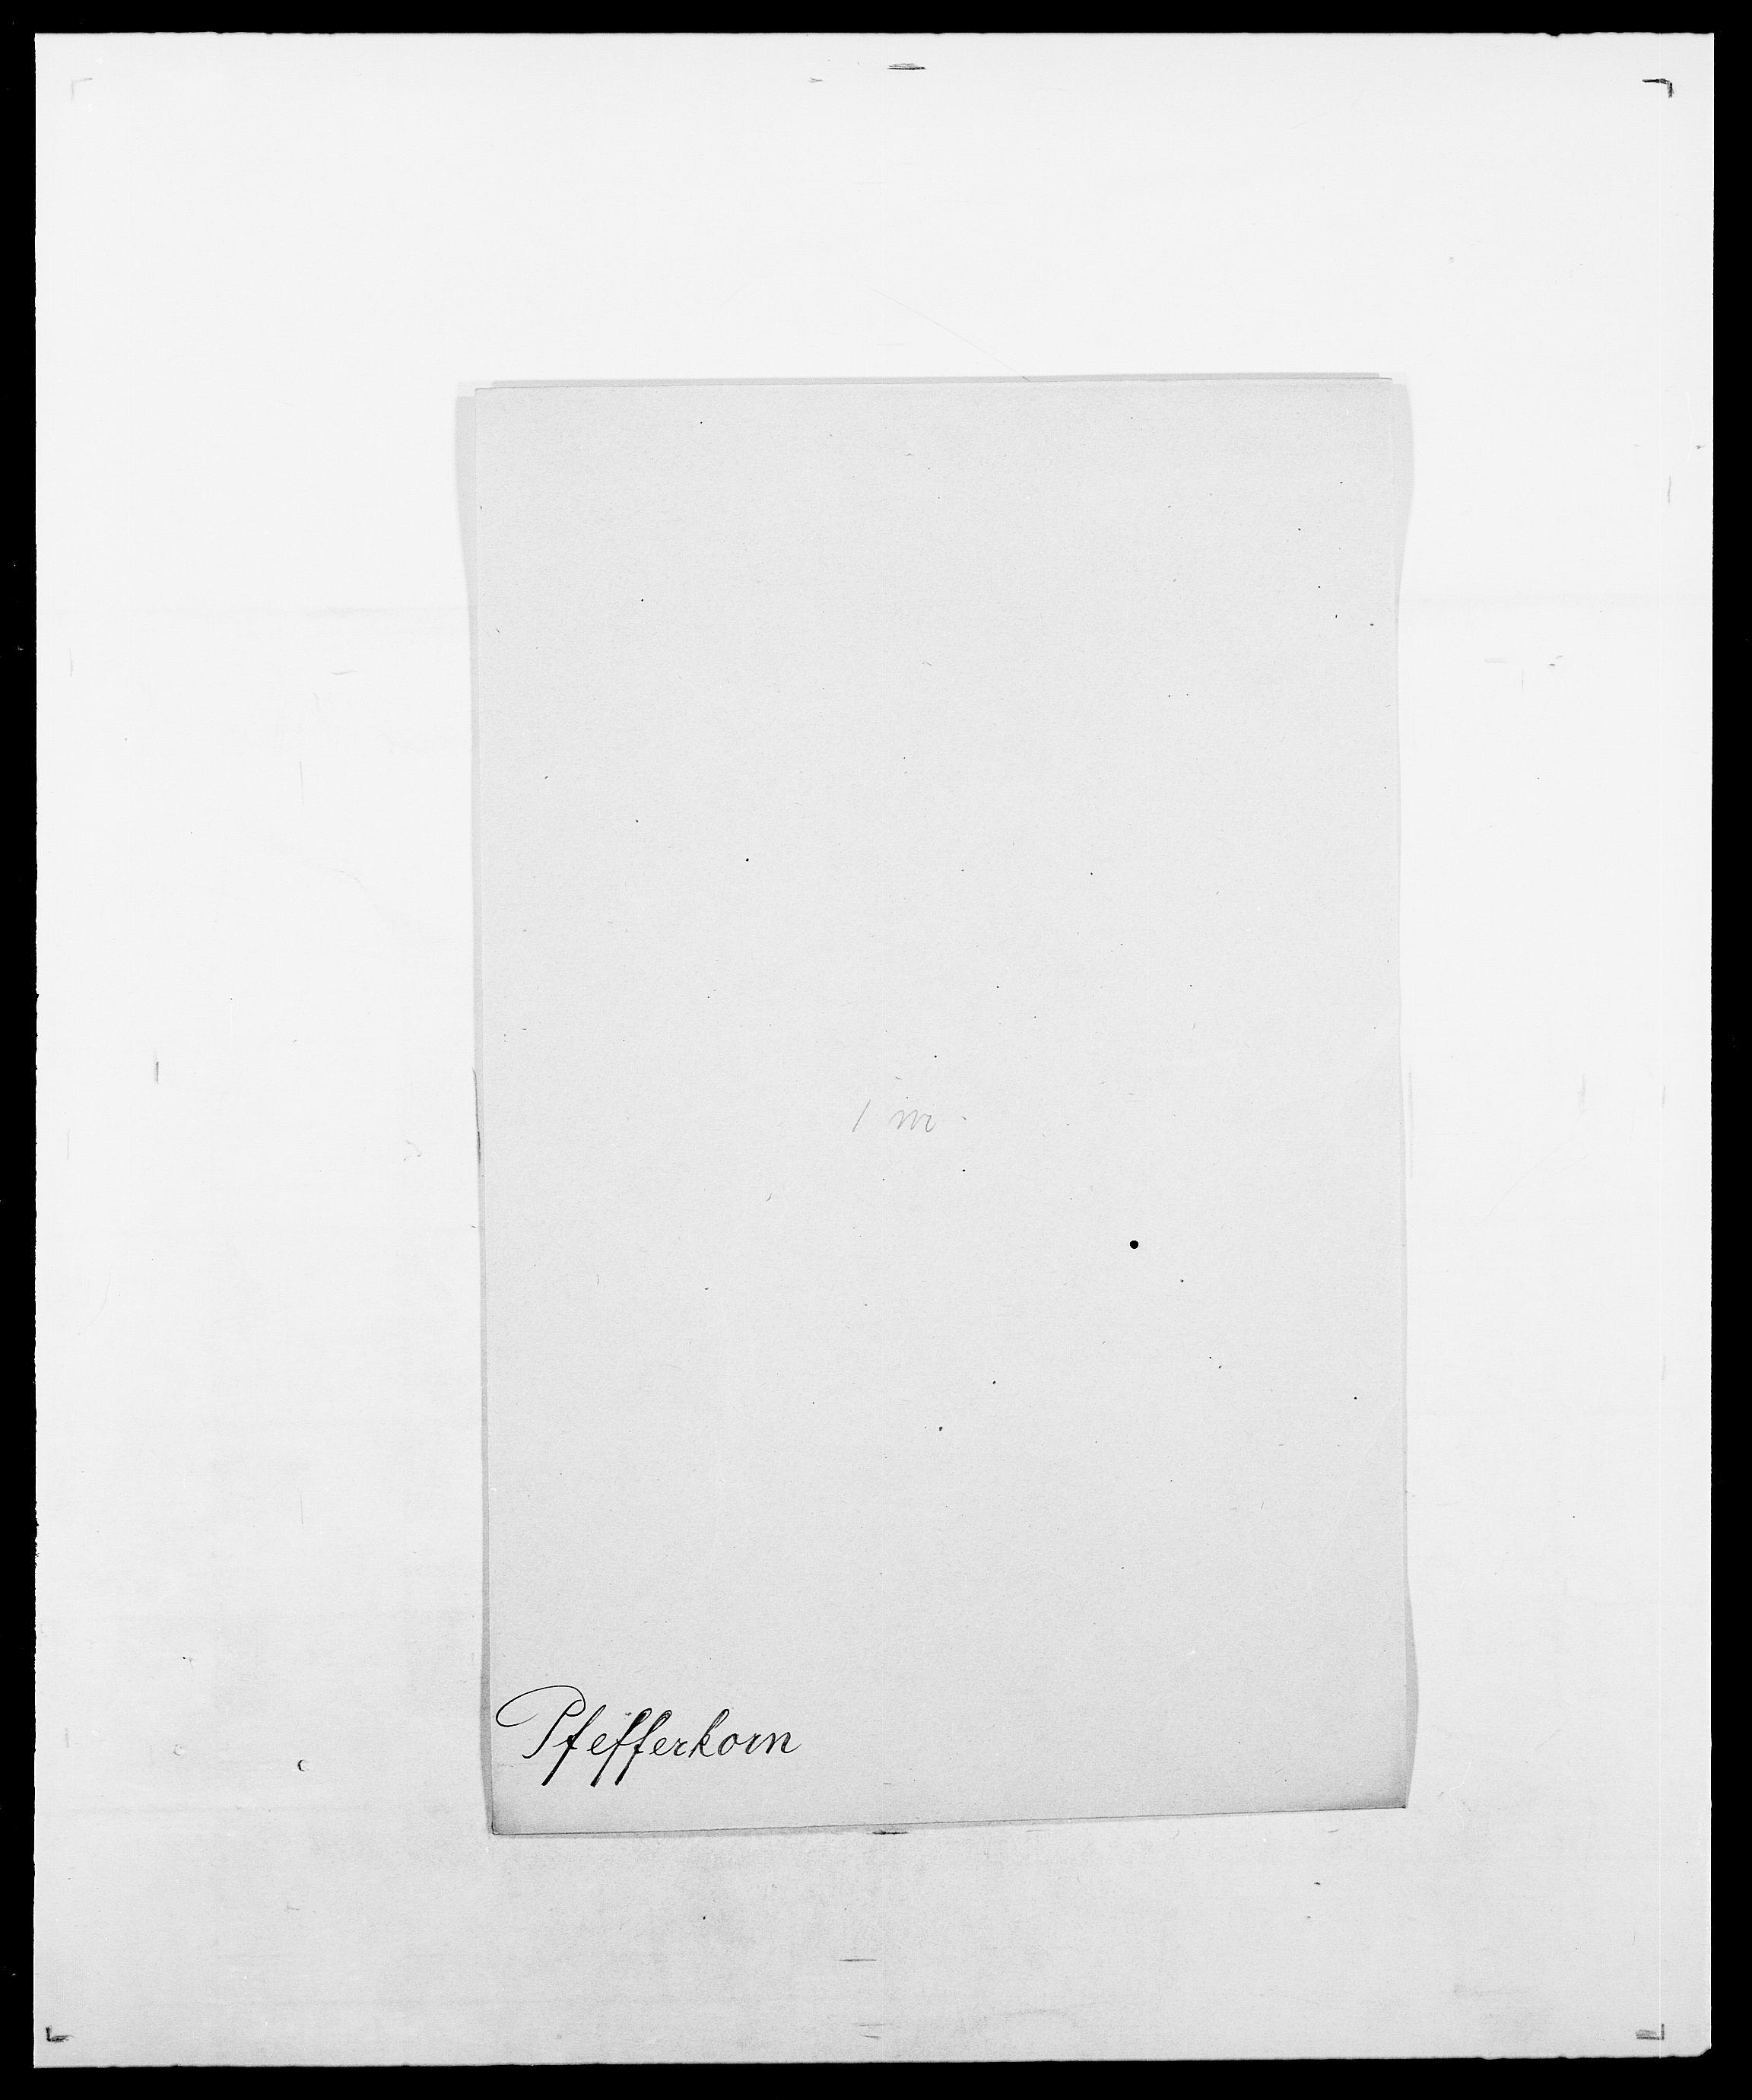 SAO, Delgobe, Charles Antoine - samling, D/Da/L0030: Paars - Pittelkov, s. 497